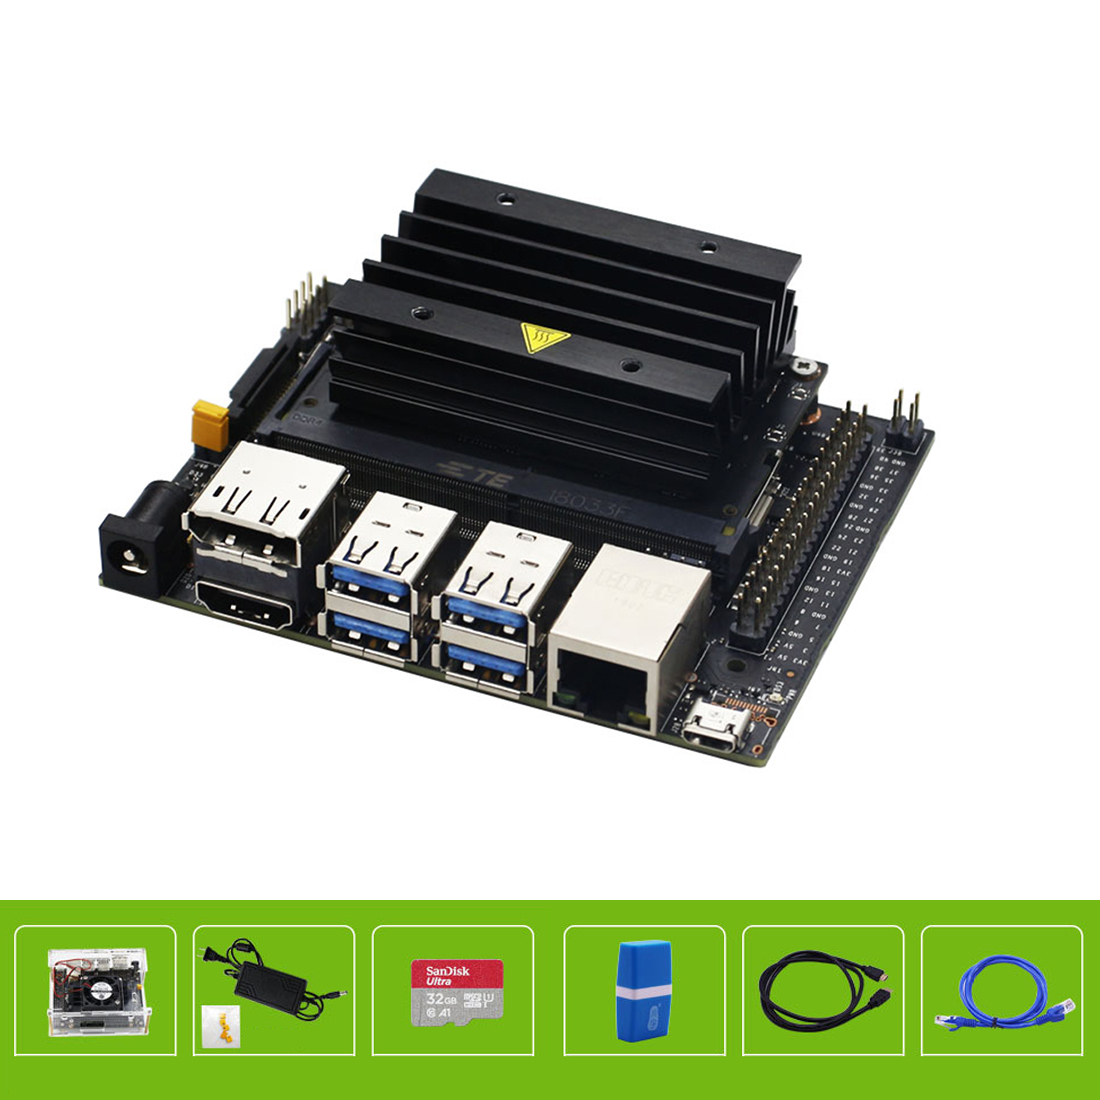 32GB SD Card Jetson NANO Programmable Robot Set Development Board Programming Kit